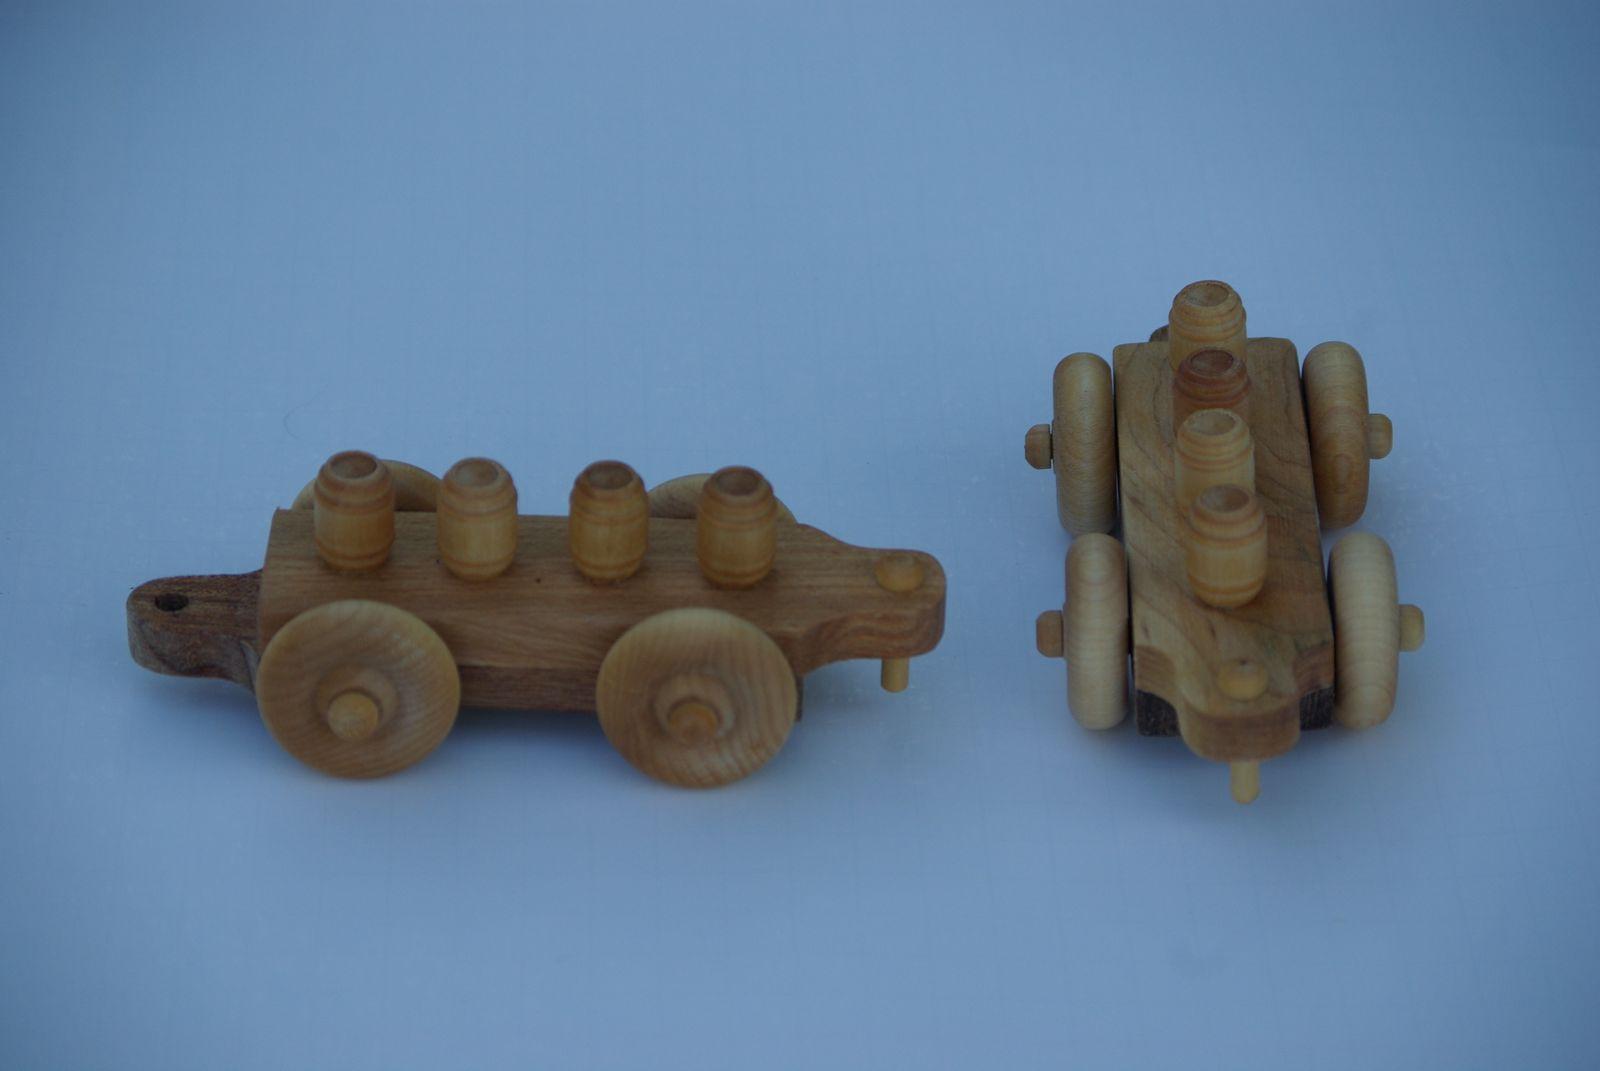 Barrel Car    small train